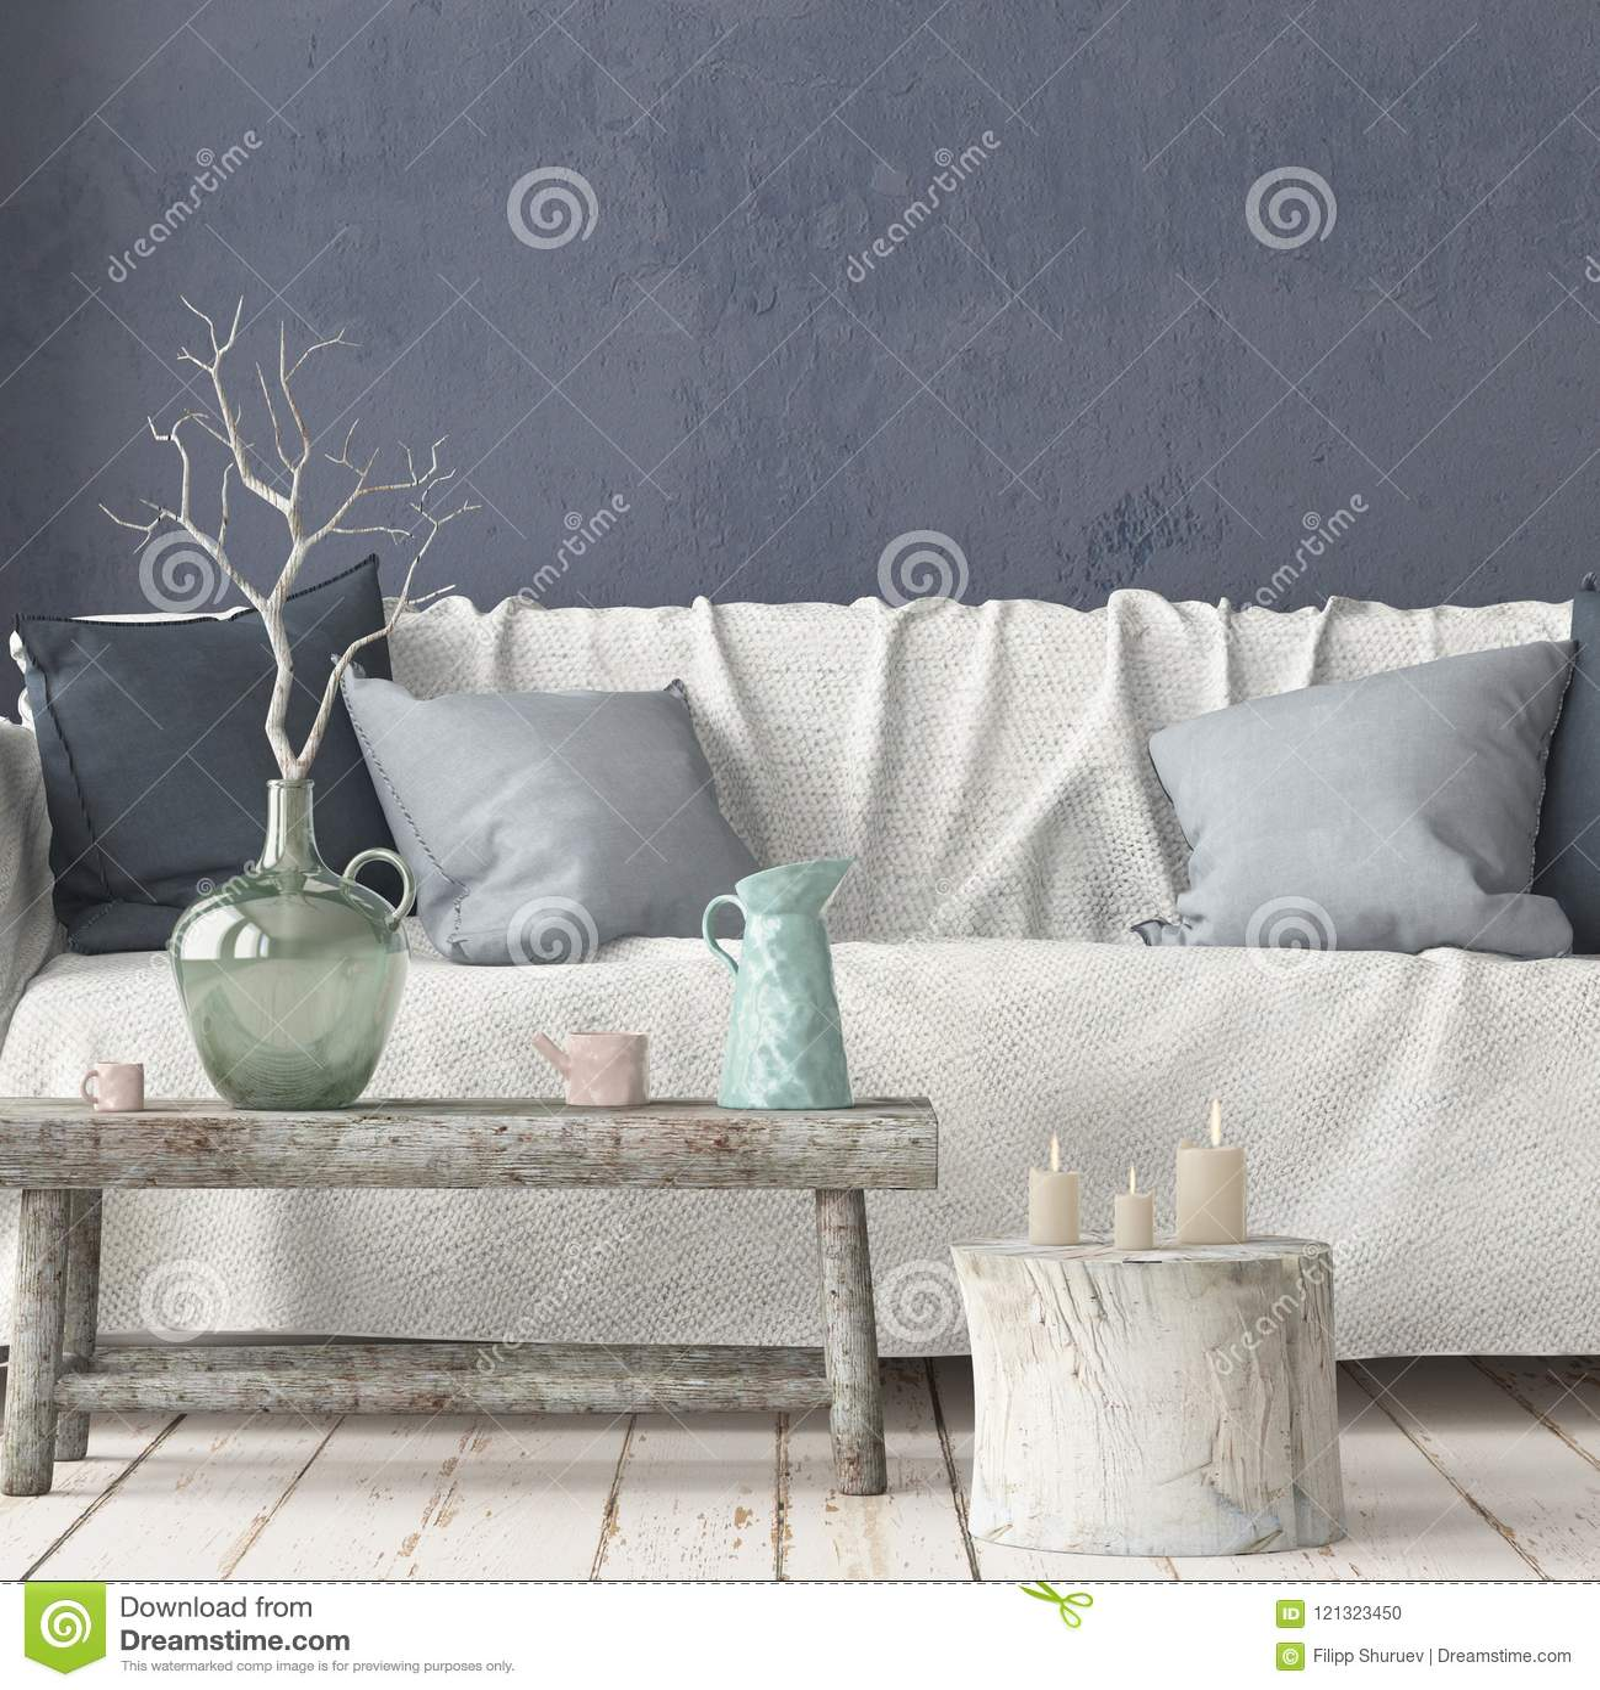 Super Mock Up Interior In Scandinavian Style With A Sofa 3D Uwap Interior Chair Design Uwaporg